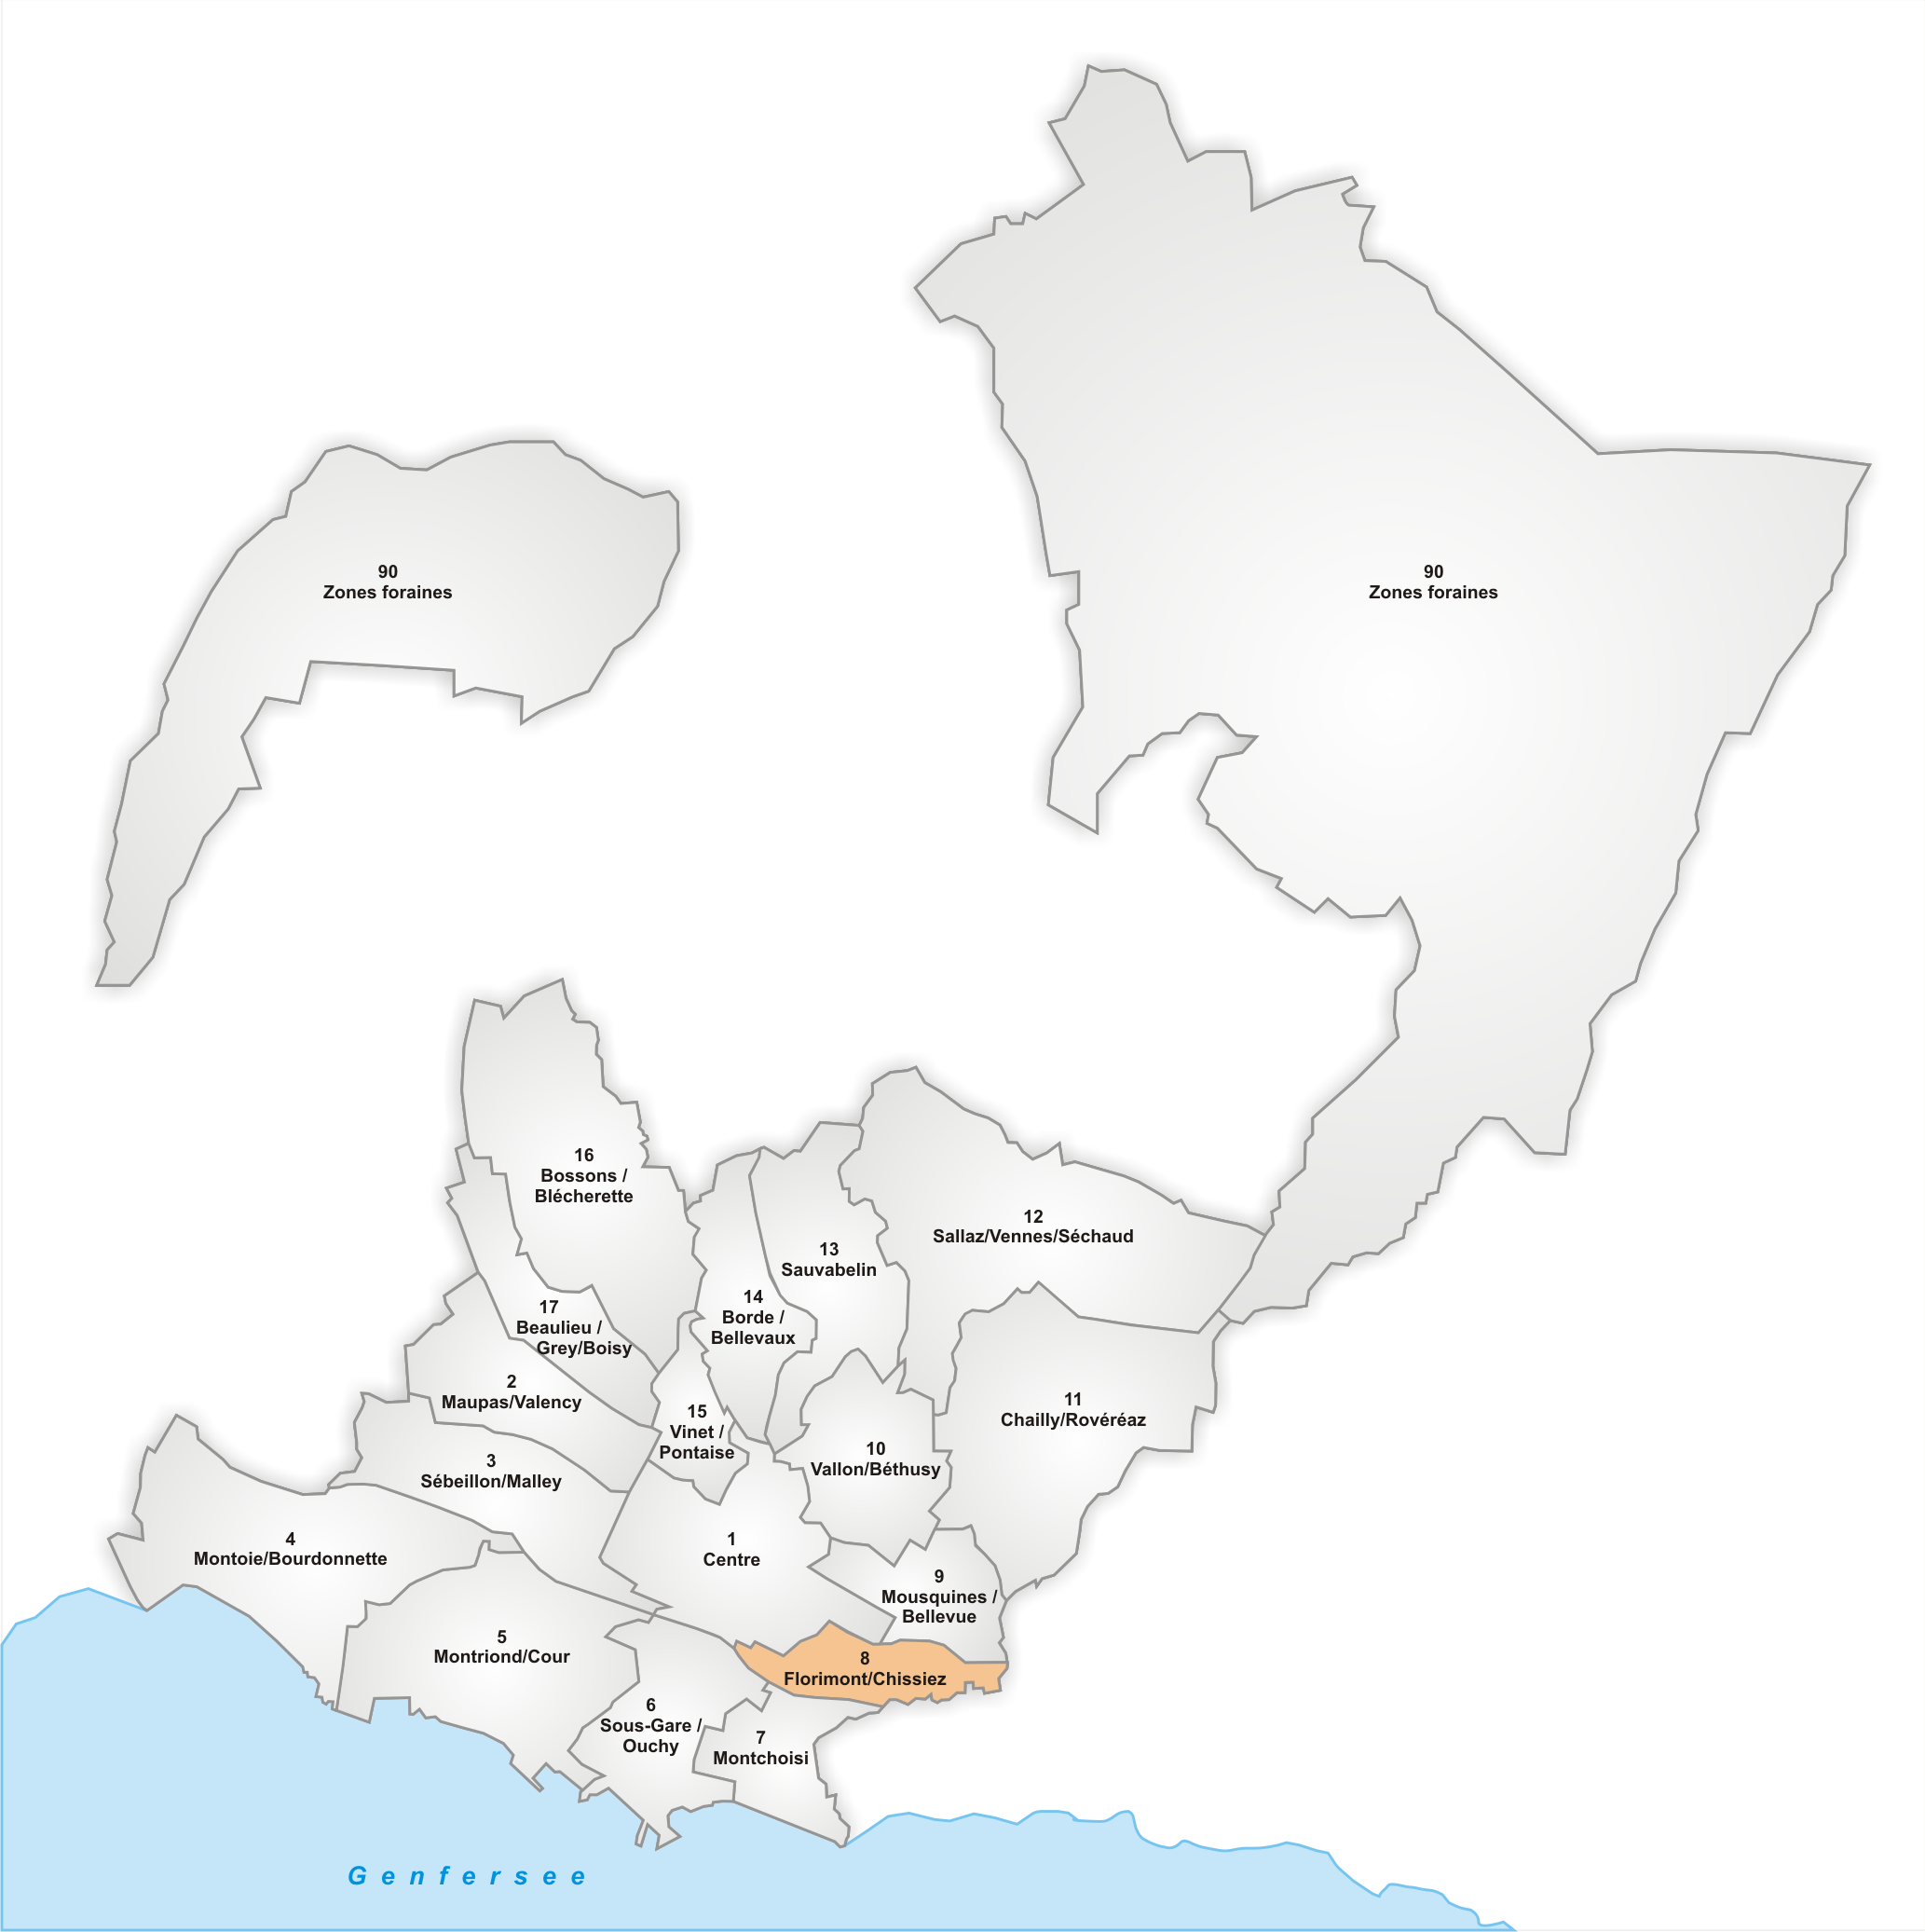 Lage des Stadtteils Florimont/Chissiez